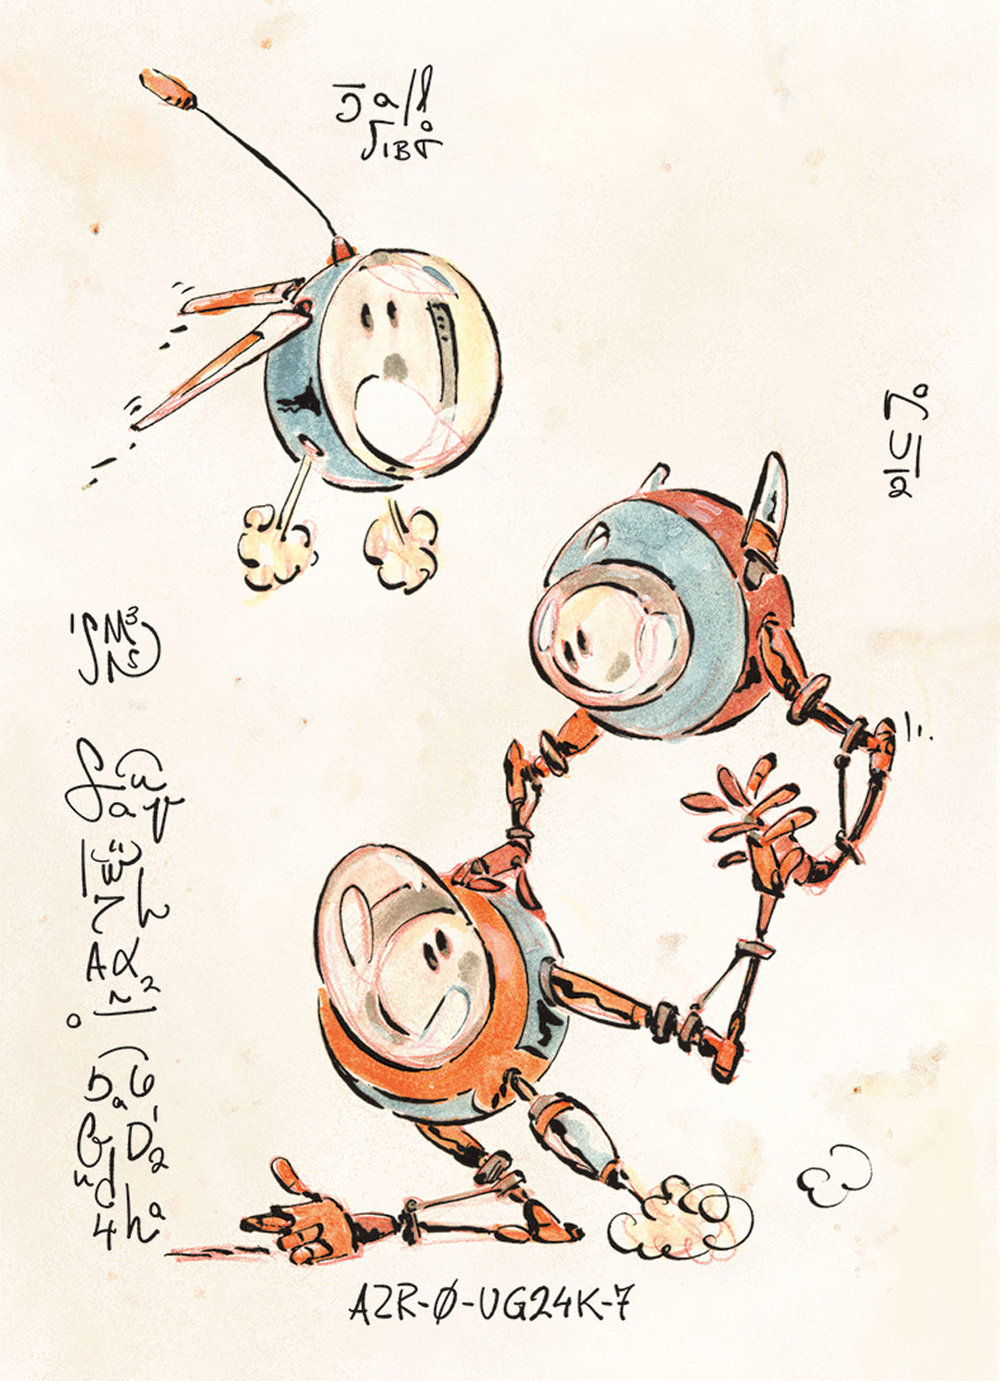 AZR-0 Robots - Book Illustration - sample page 1